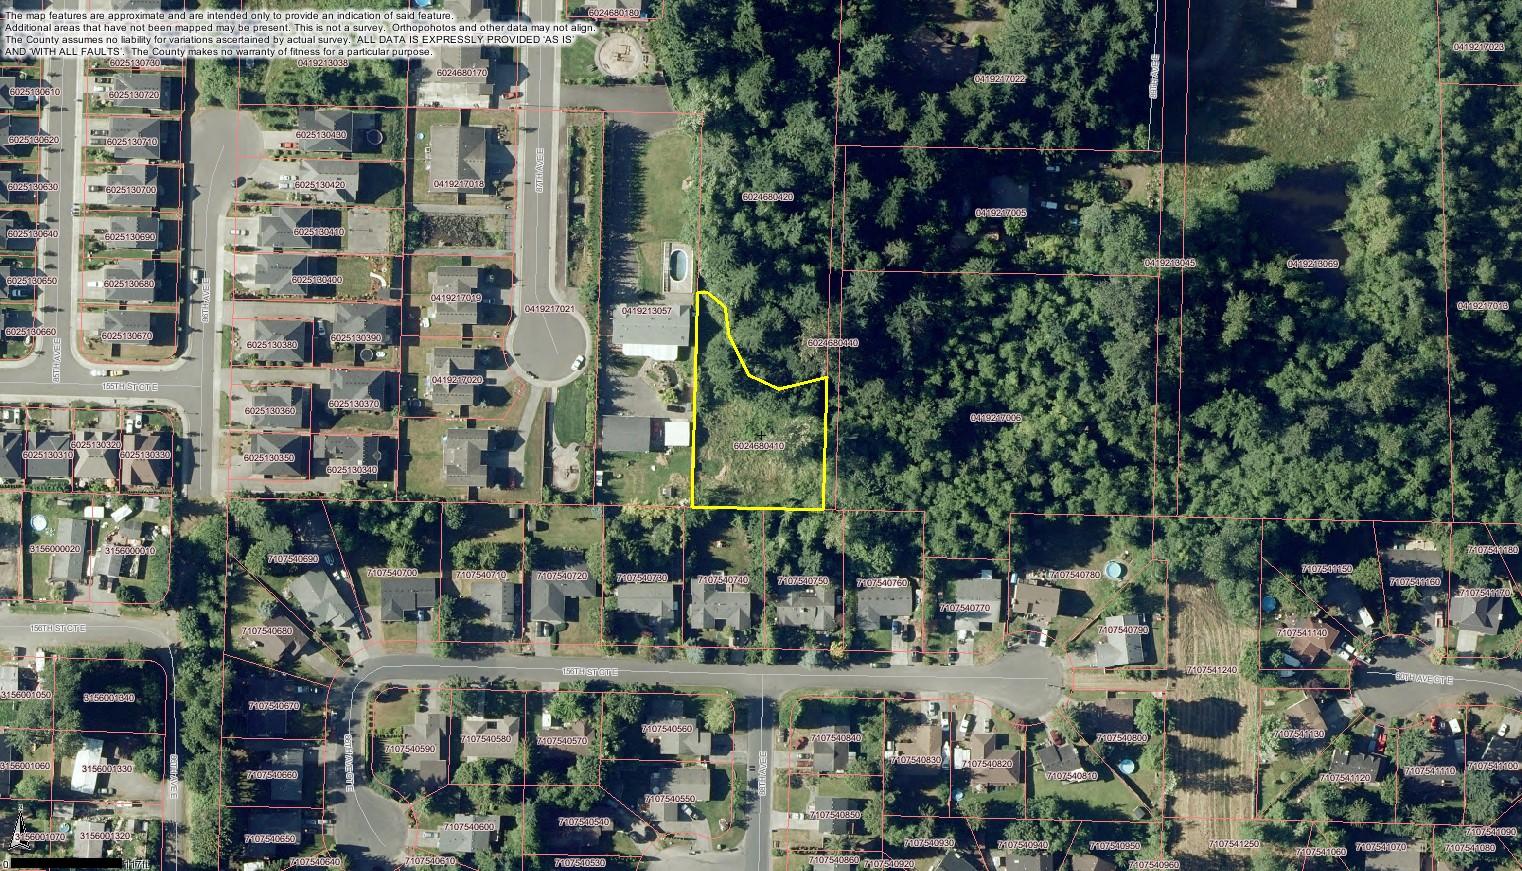 Pierce County Property Gis